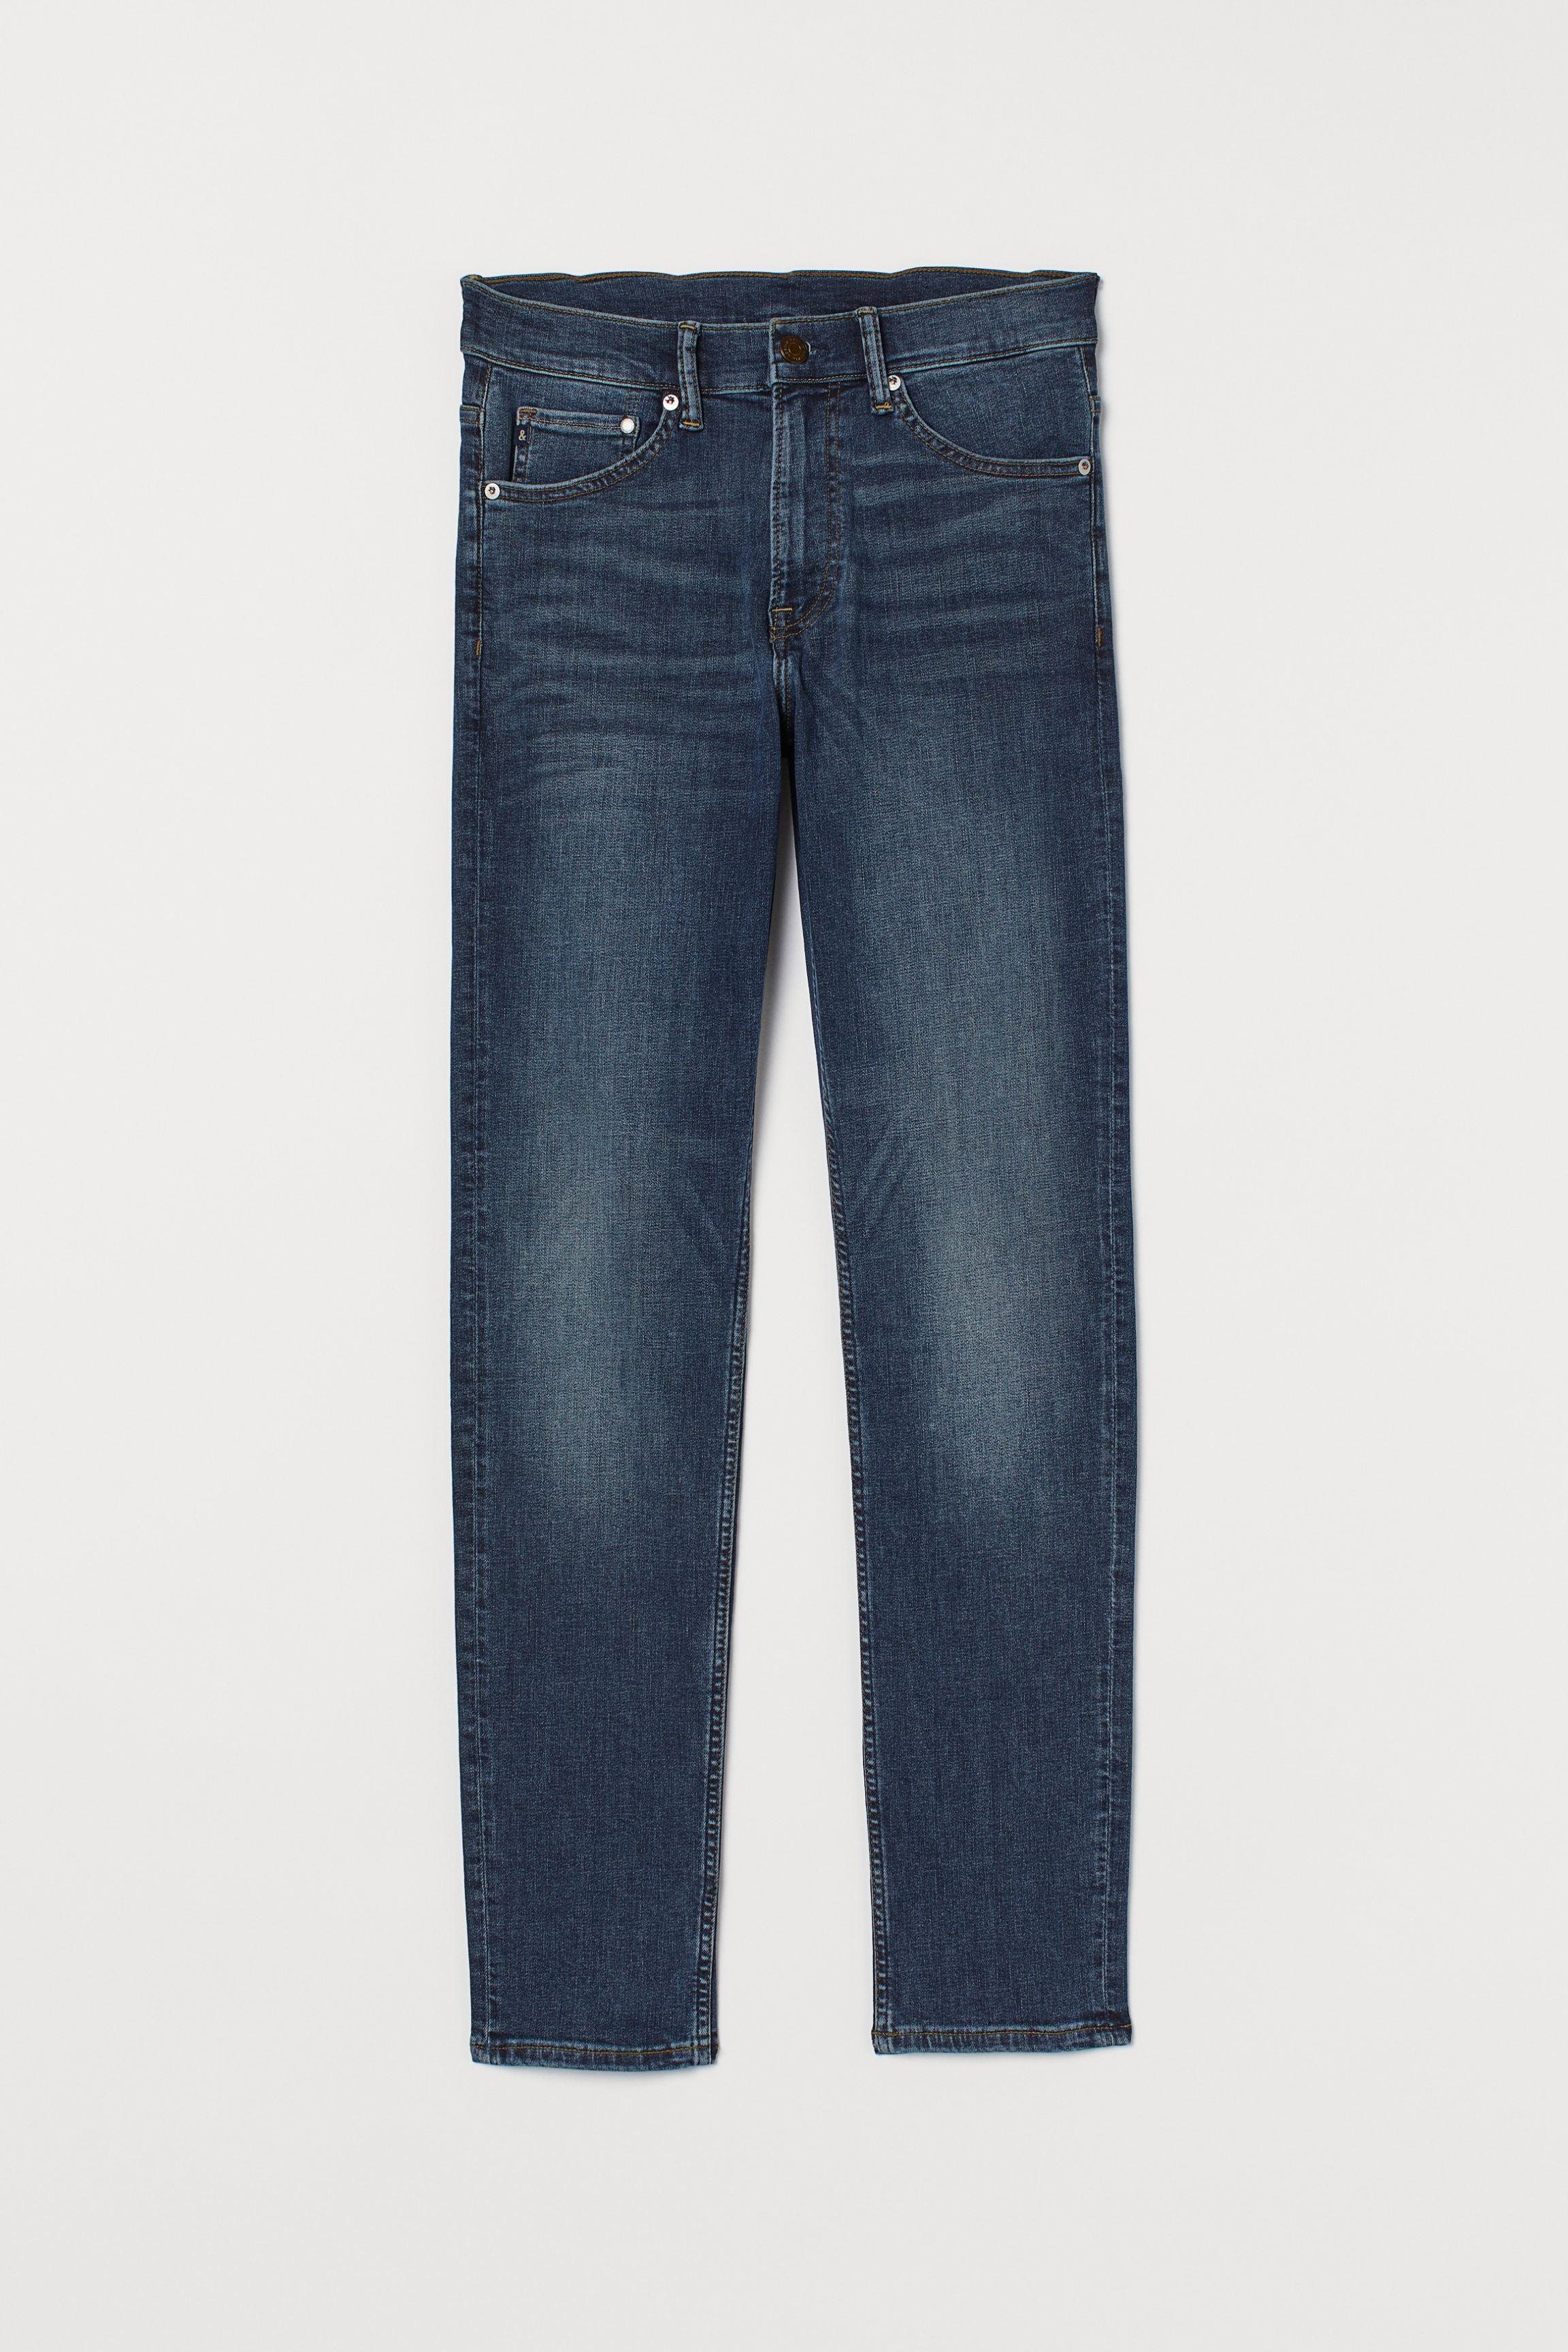 Freefit® Slim Jeans